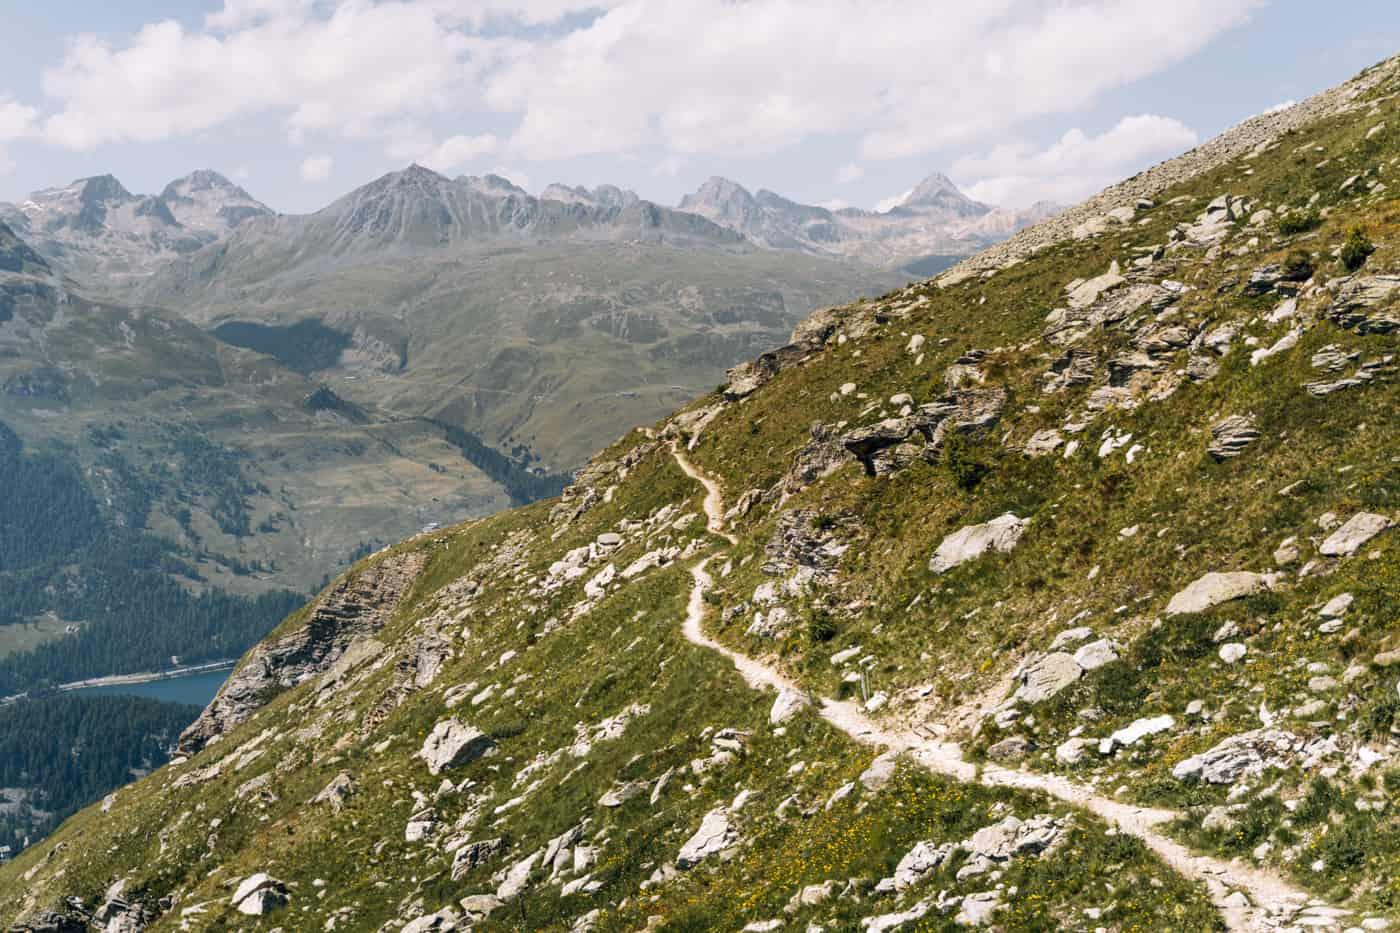 Wandern in Pontresina - 5 unvergessliche Bergtouren: Val Roseg - Fuorcla Surlej - Sankt Moritz